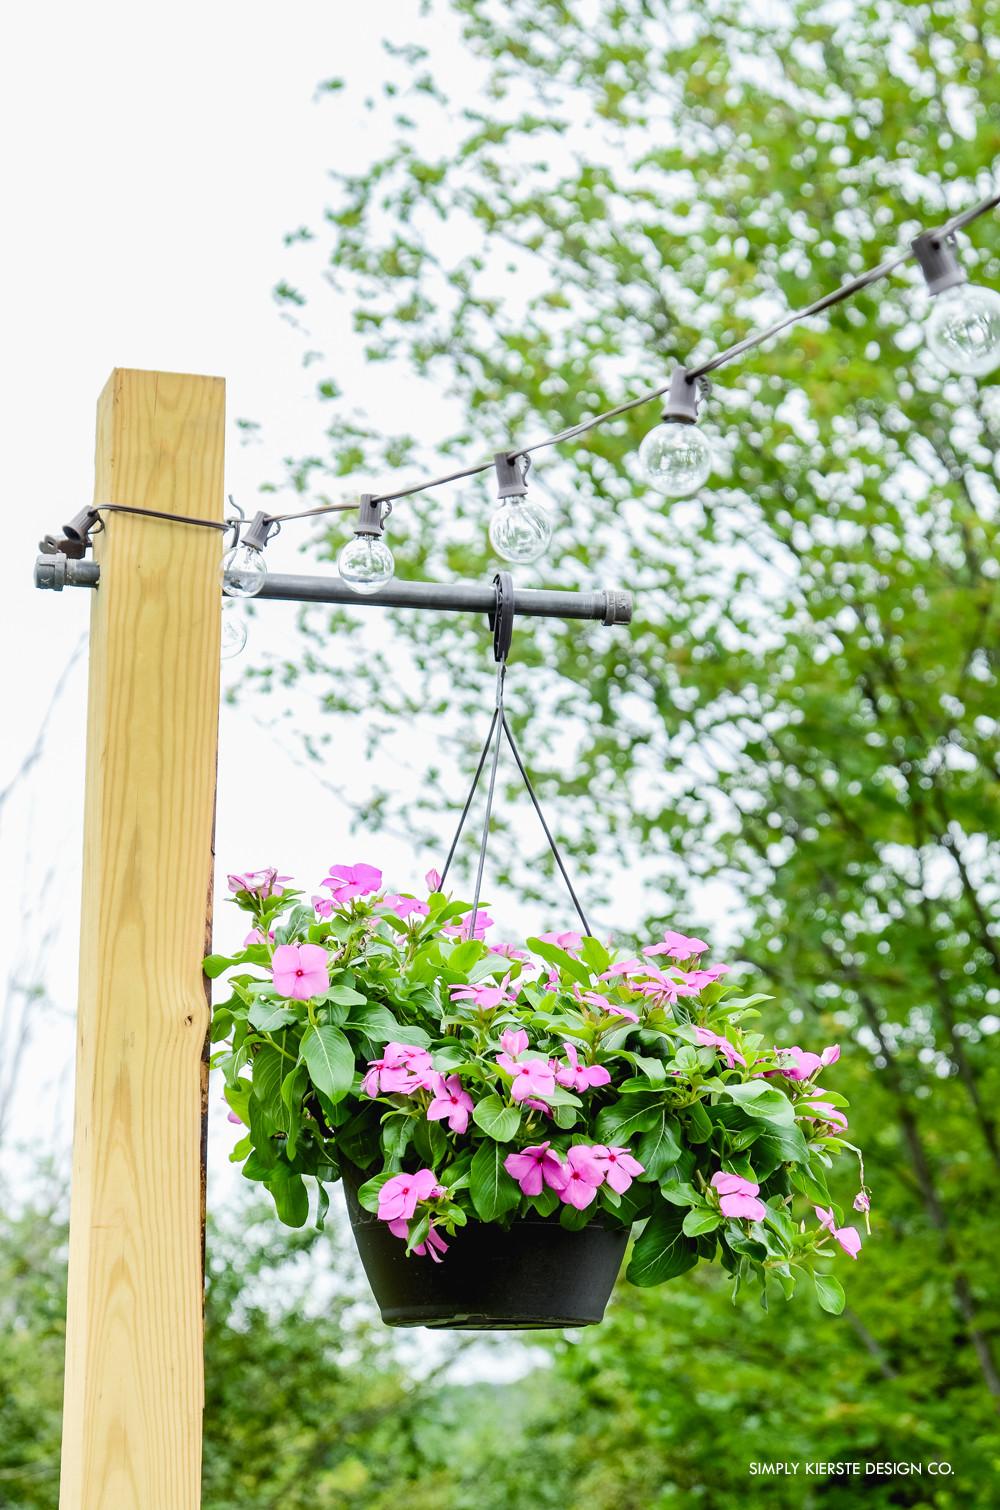 DIY Outdoor String Lights  Outdoor String Lights on DIY Posts Simply Kierste Design Co